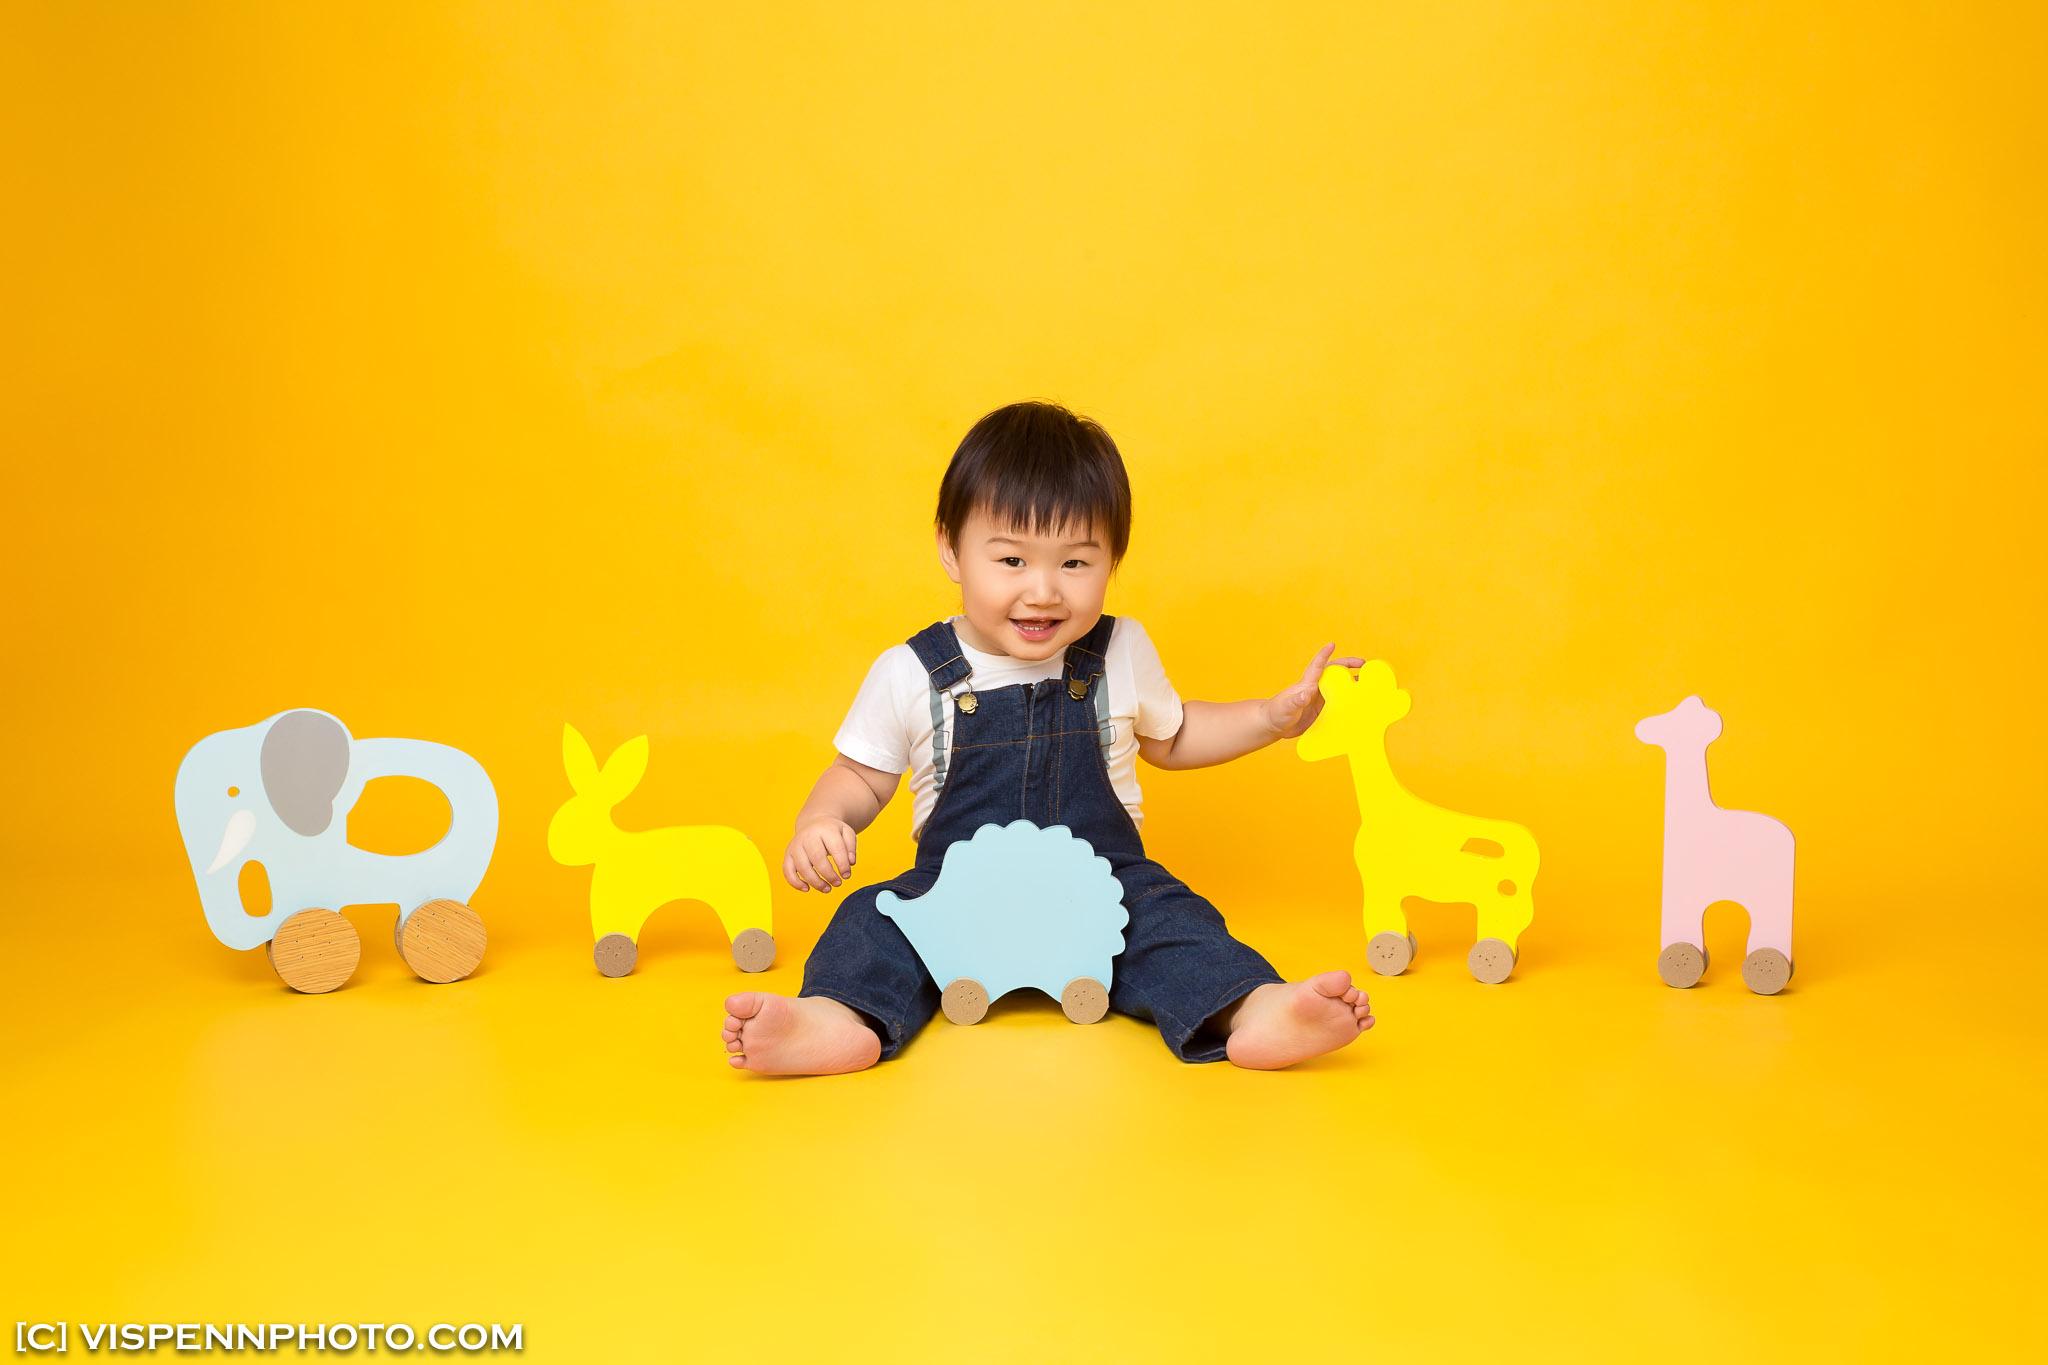 Melbourne Newborn Baby Family Photo BaoBao VISPENN 墨尔本 儿童 宝宝 百天照 满月照 孕妇照 全家福 KIDS AbbyHUANG 2029 VISPENN